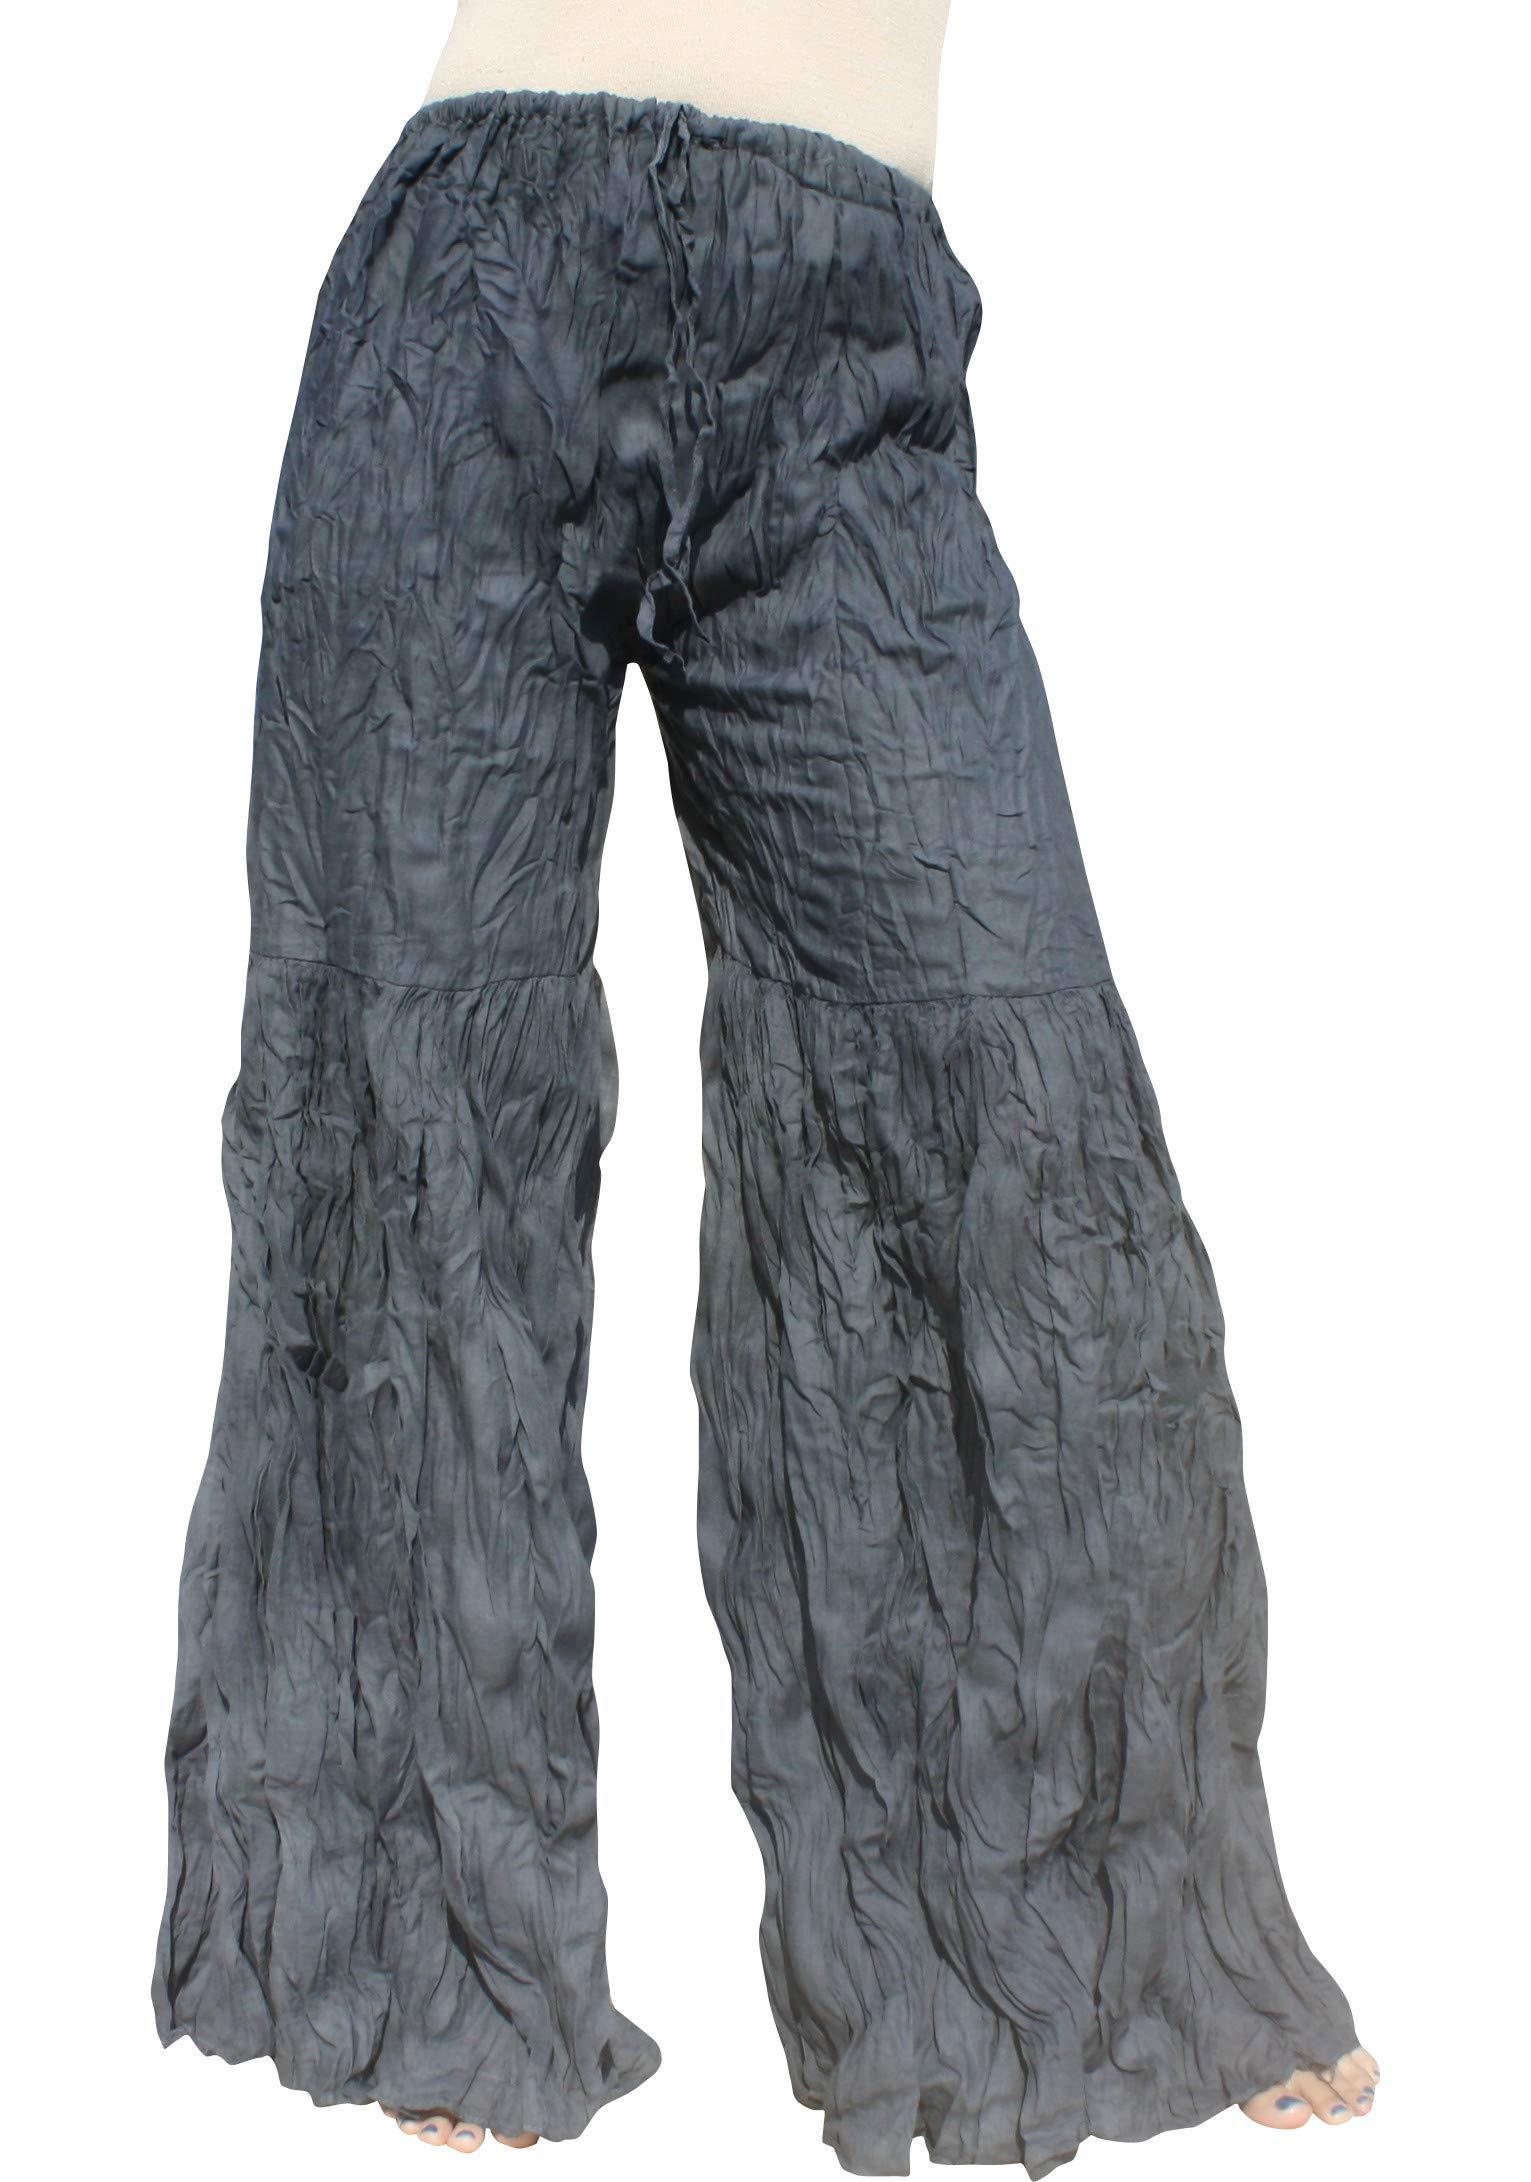 Raan Pah Muang Brand Wide Lower Leg Flared Light Cotton Stepped Pants Baggy Cut, X-Large, Payne's Gray by Raan Pah Muang